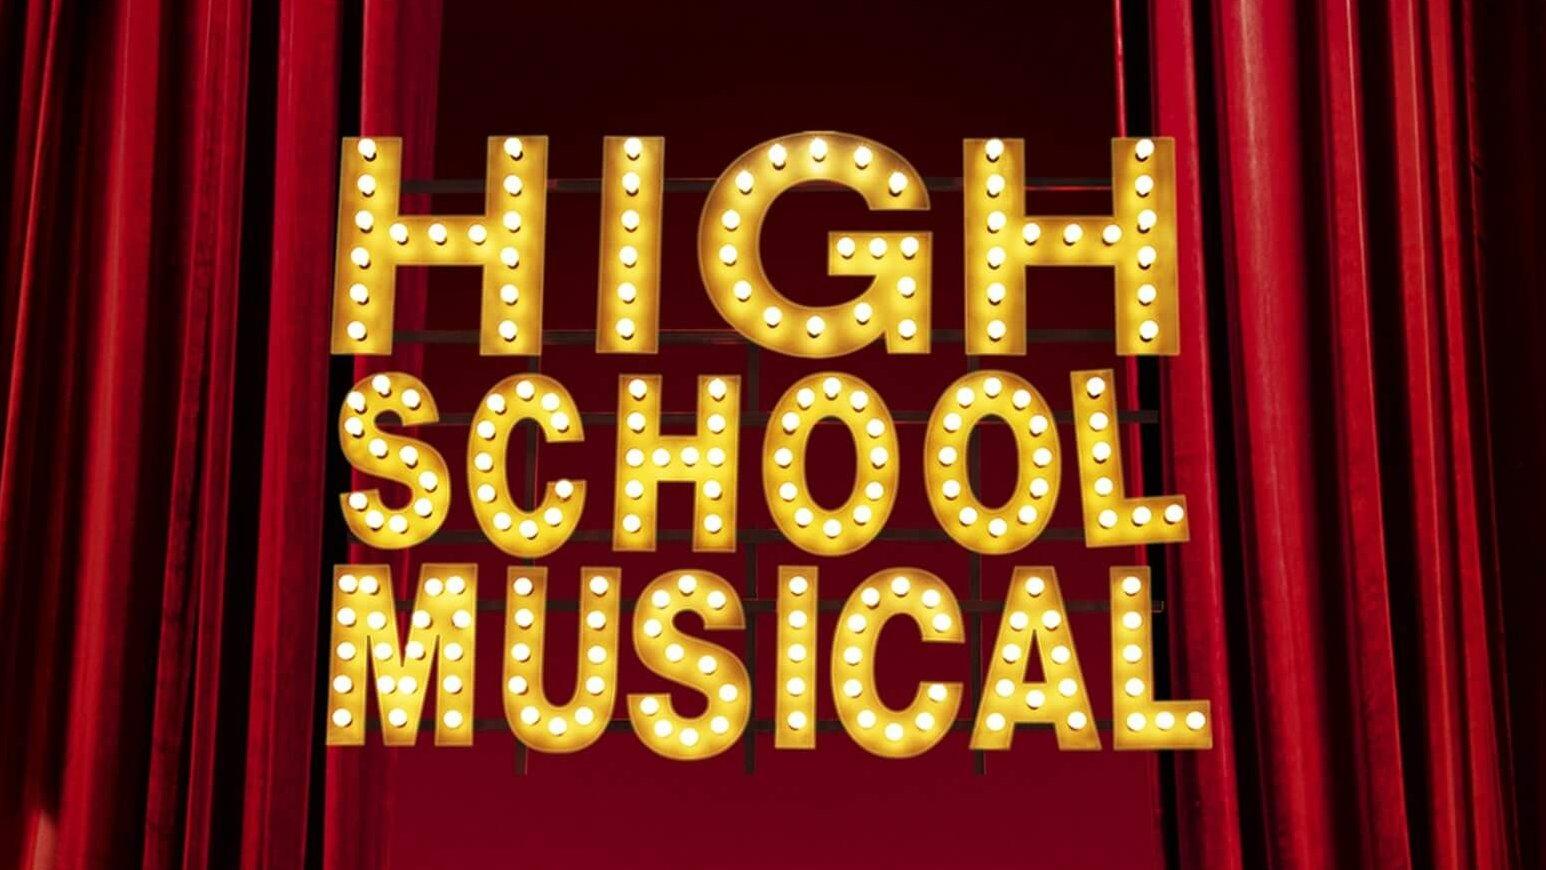 High School Musical - The Musical